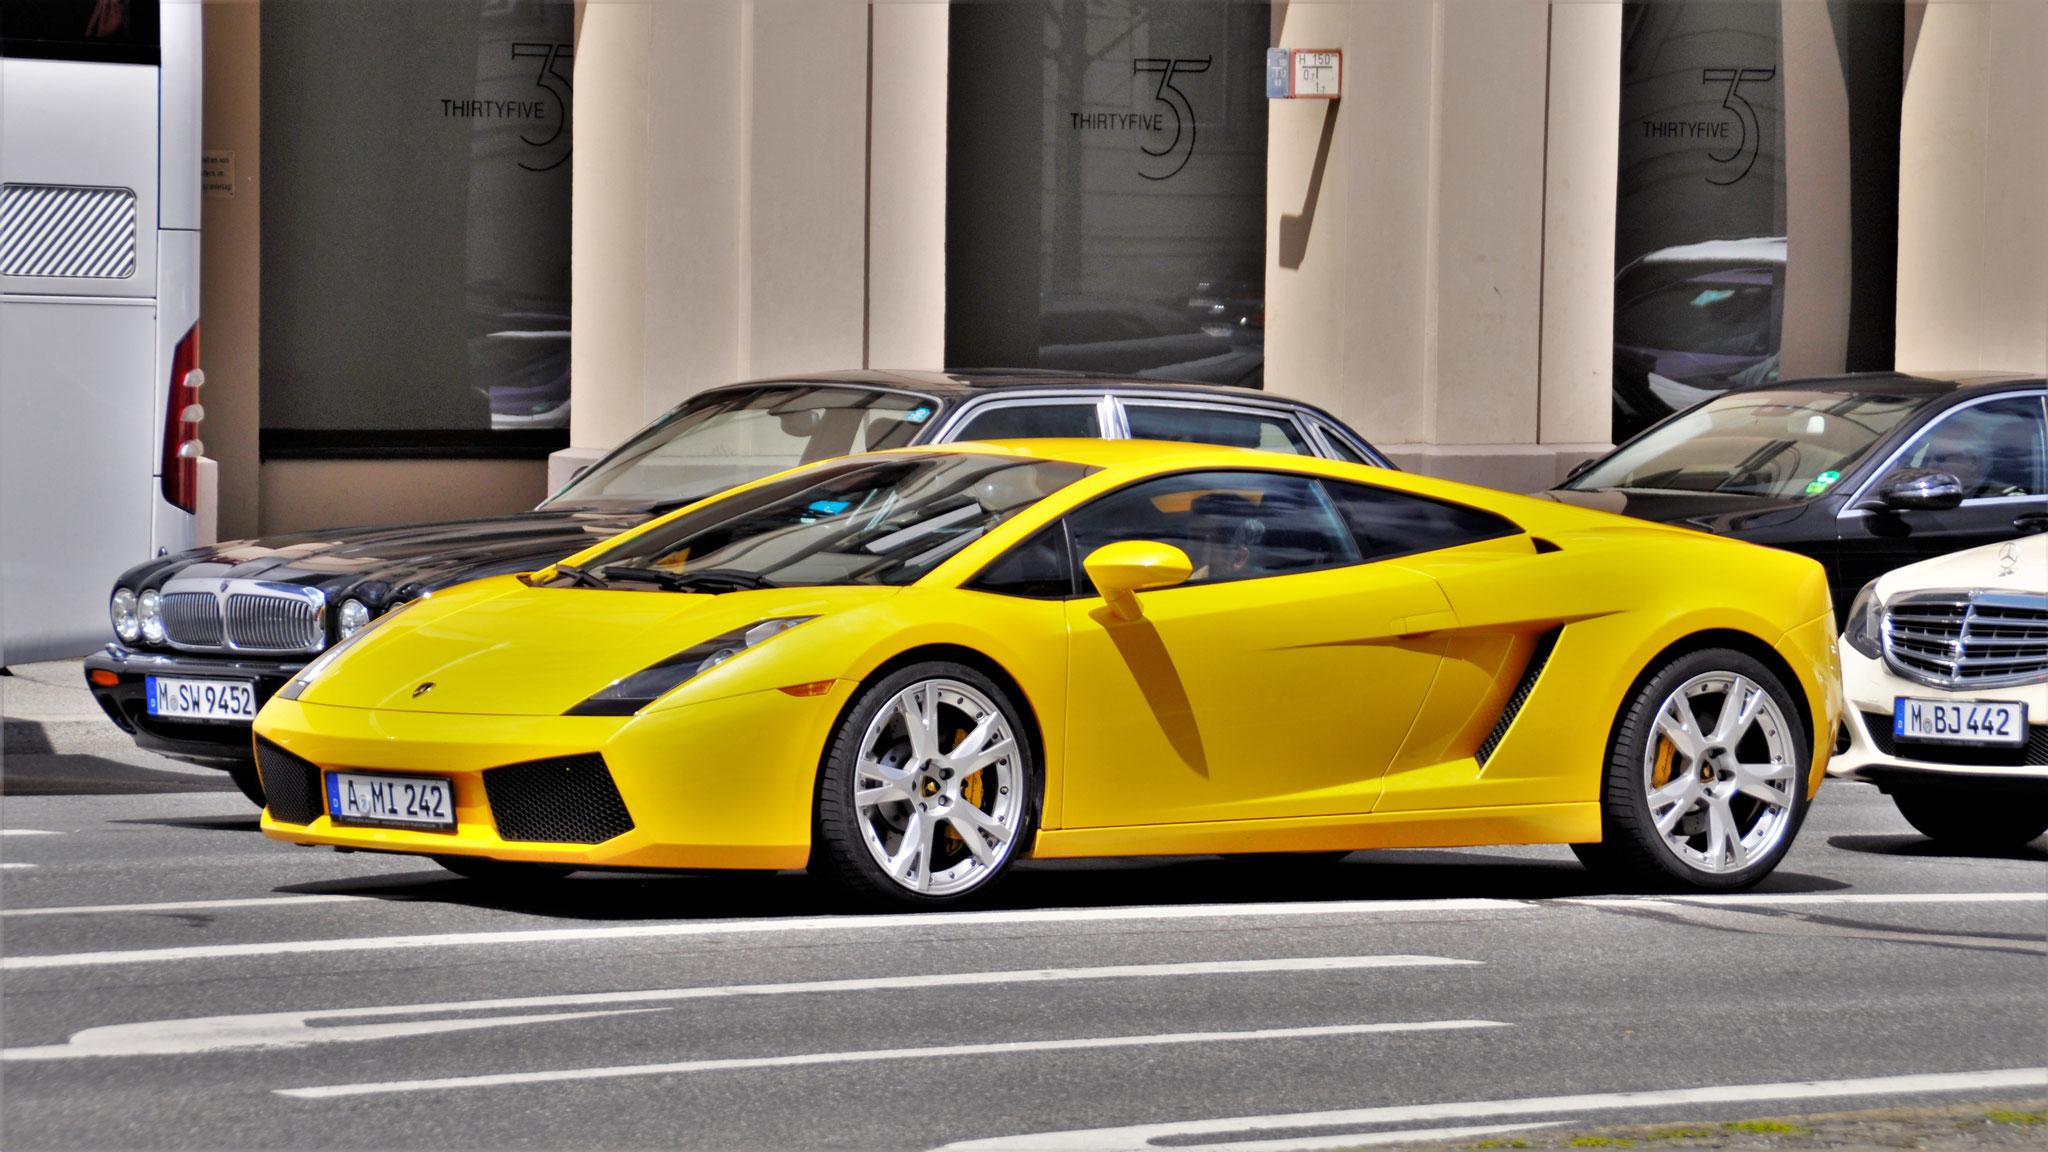 Lamborghini Gallardo LP 520 - A-MI-252